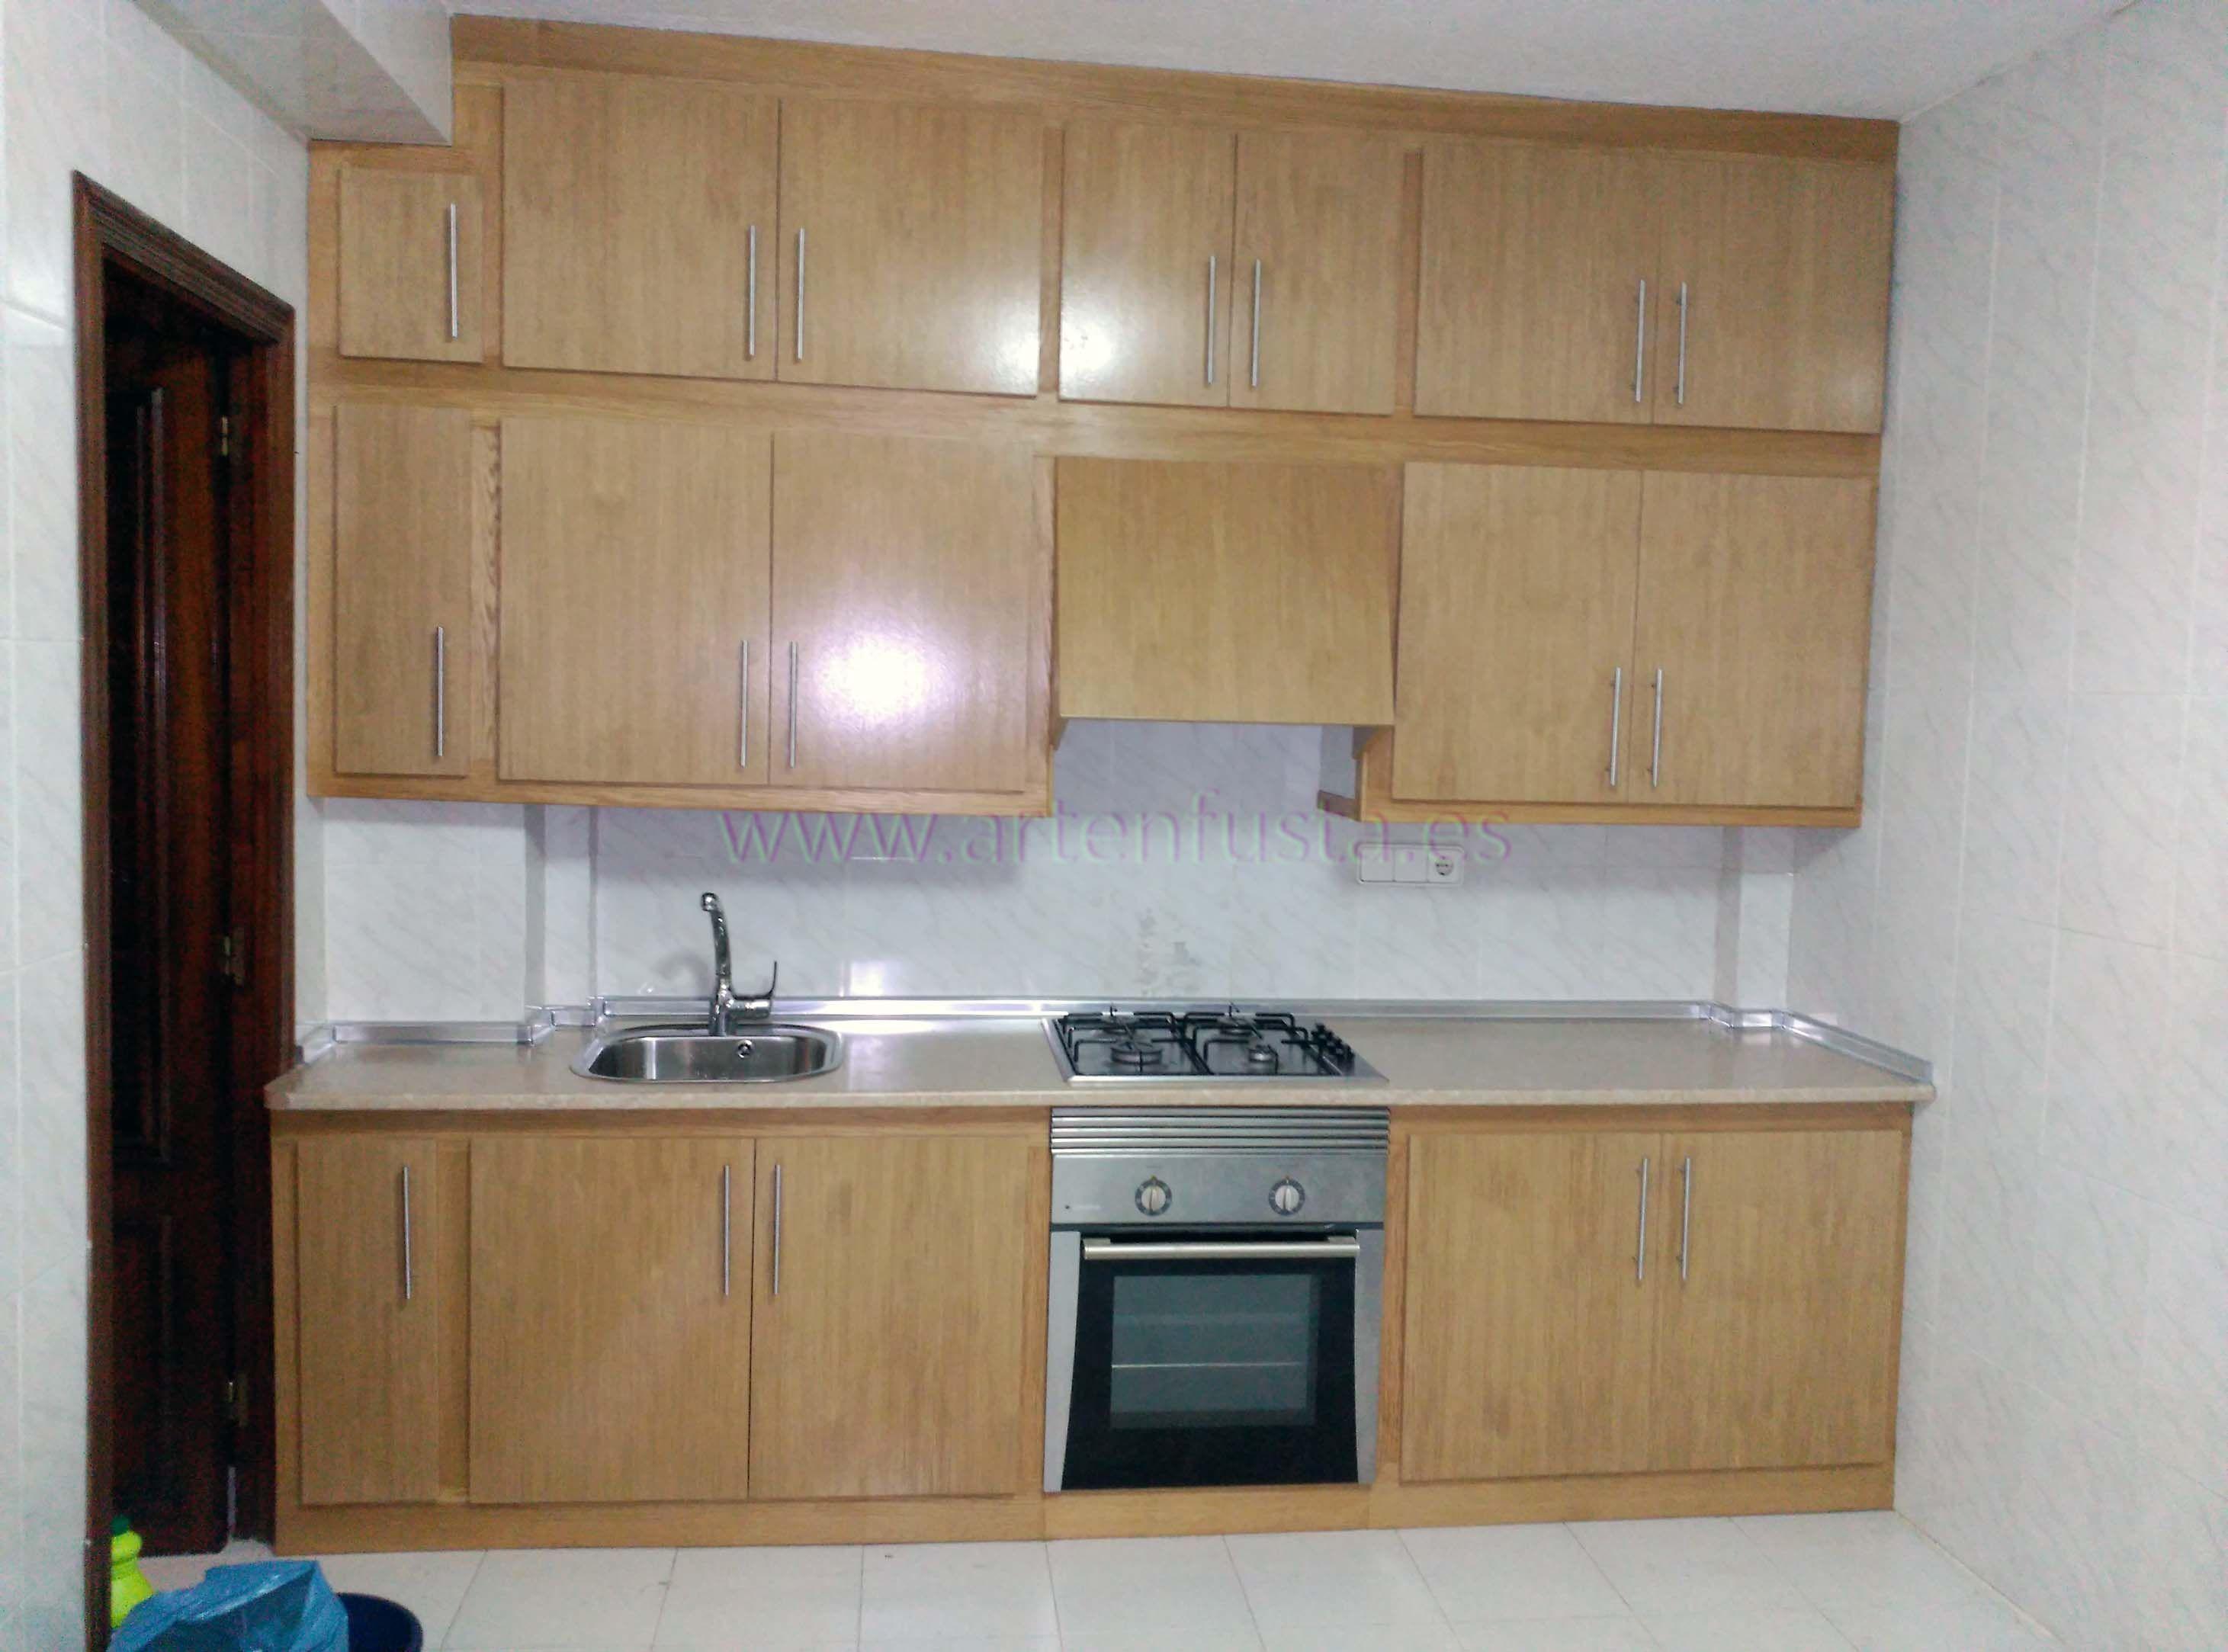 Muebles De Cocina Carpinteria J Jimenez Carpinter A A Tu Medida  # Muebles Muy Bonitos